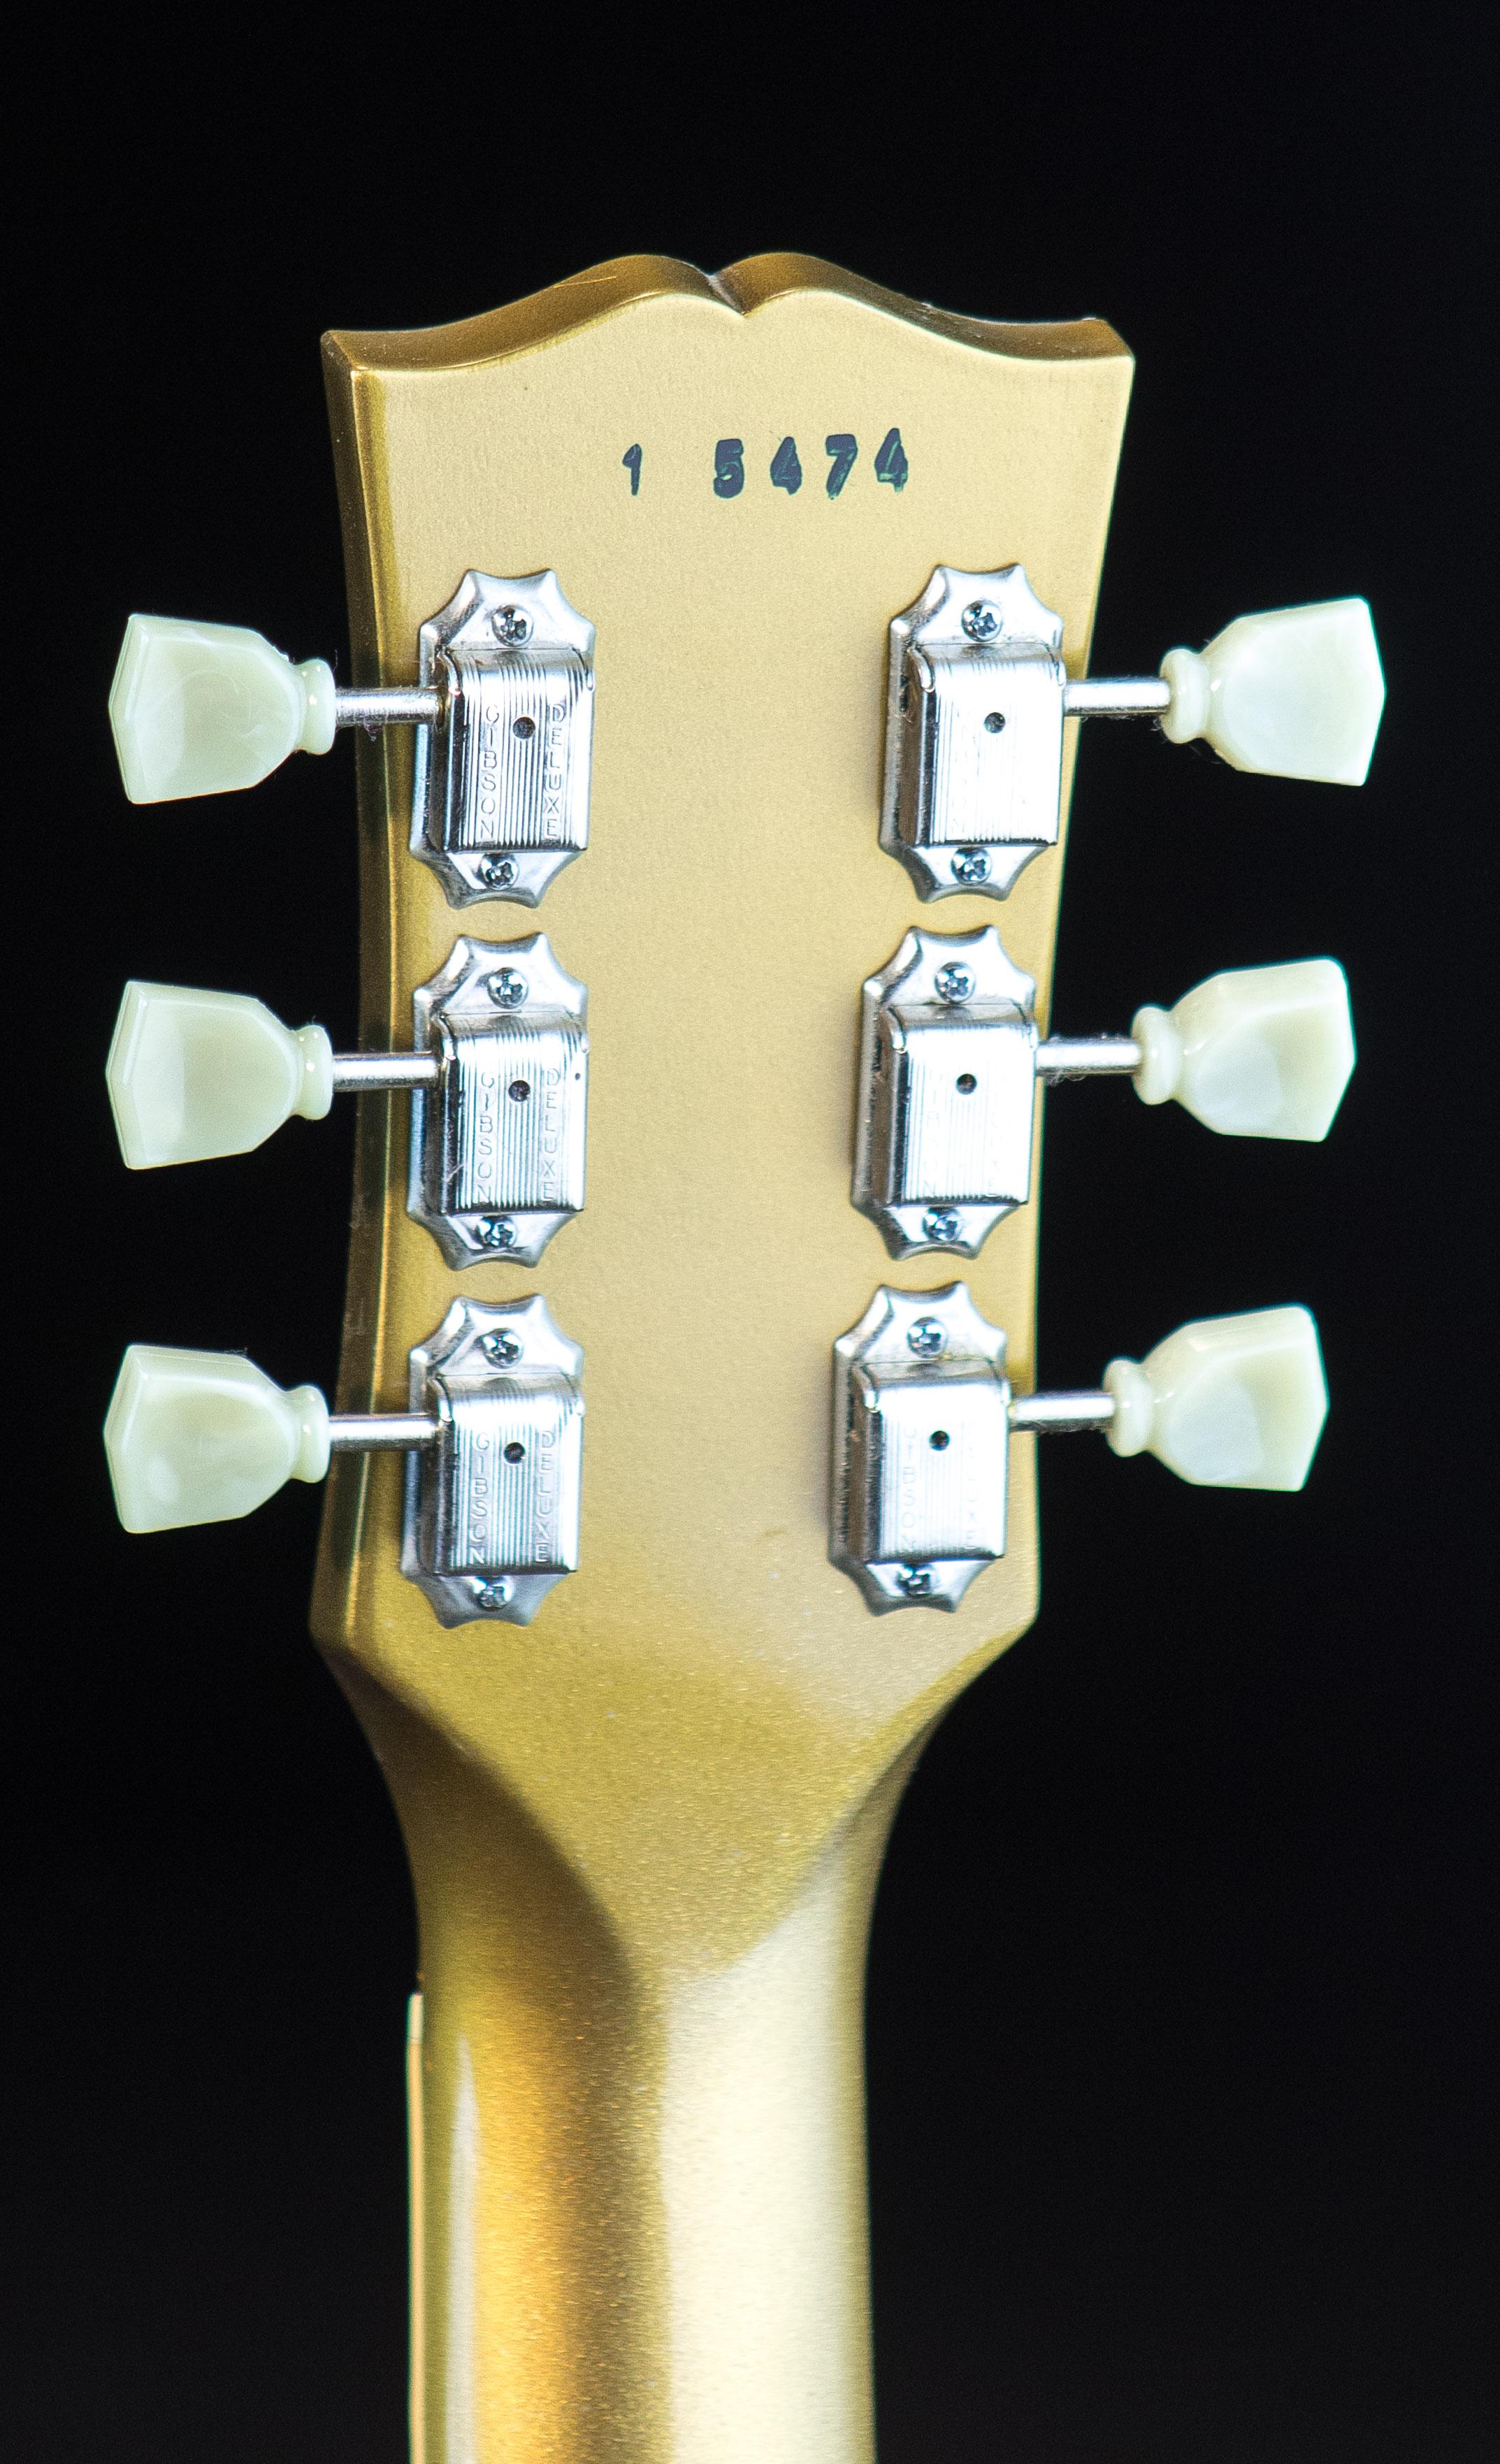 gibson 500t pickup wiring diagram 1989 yamaha warrior 350 1991 les paul classic goldtop bullion guitar